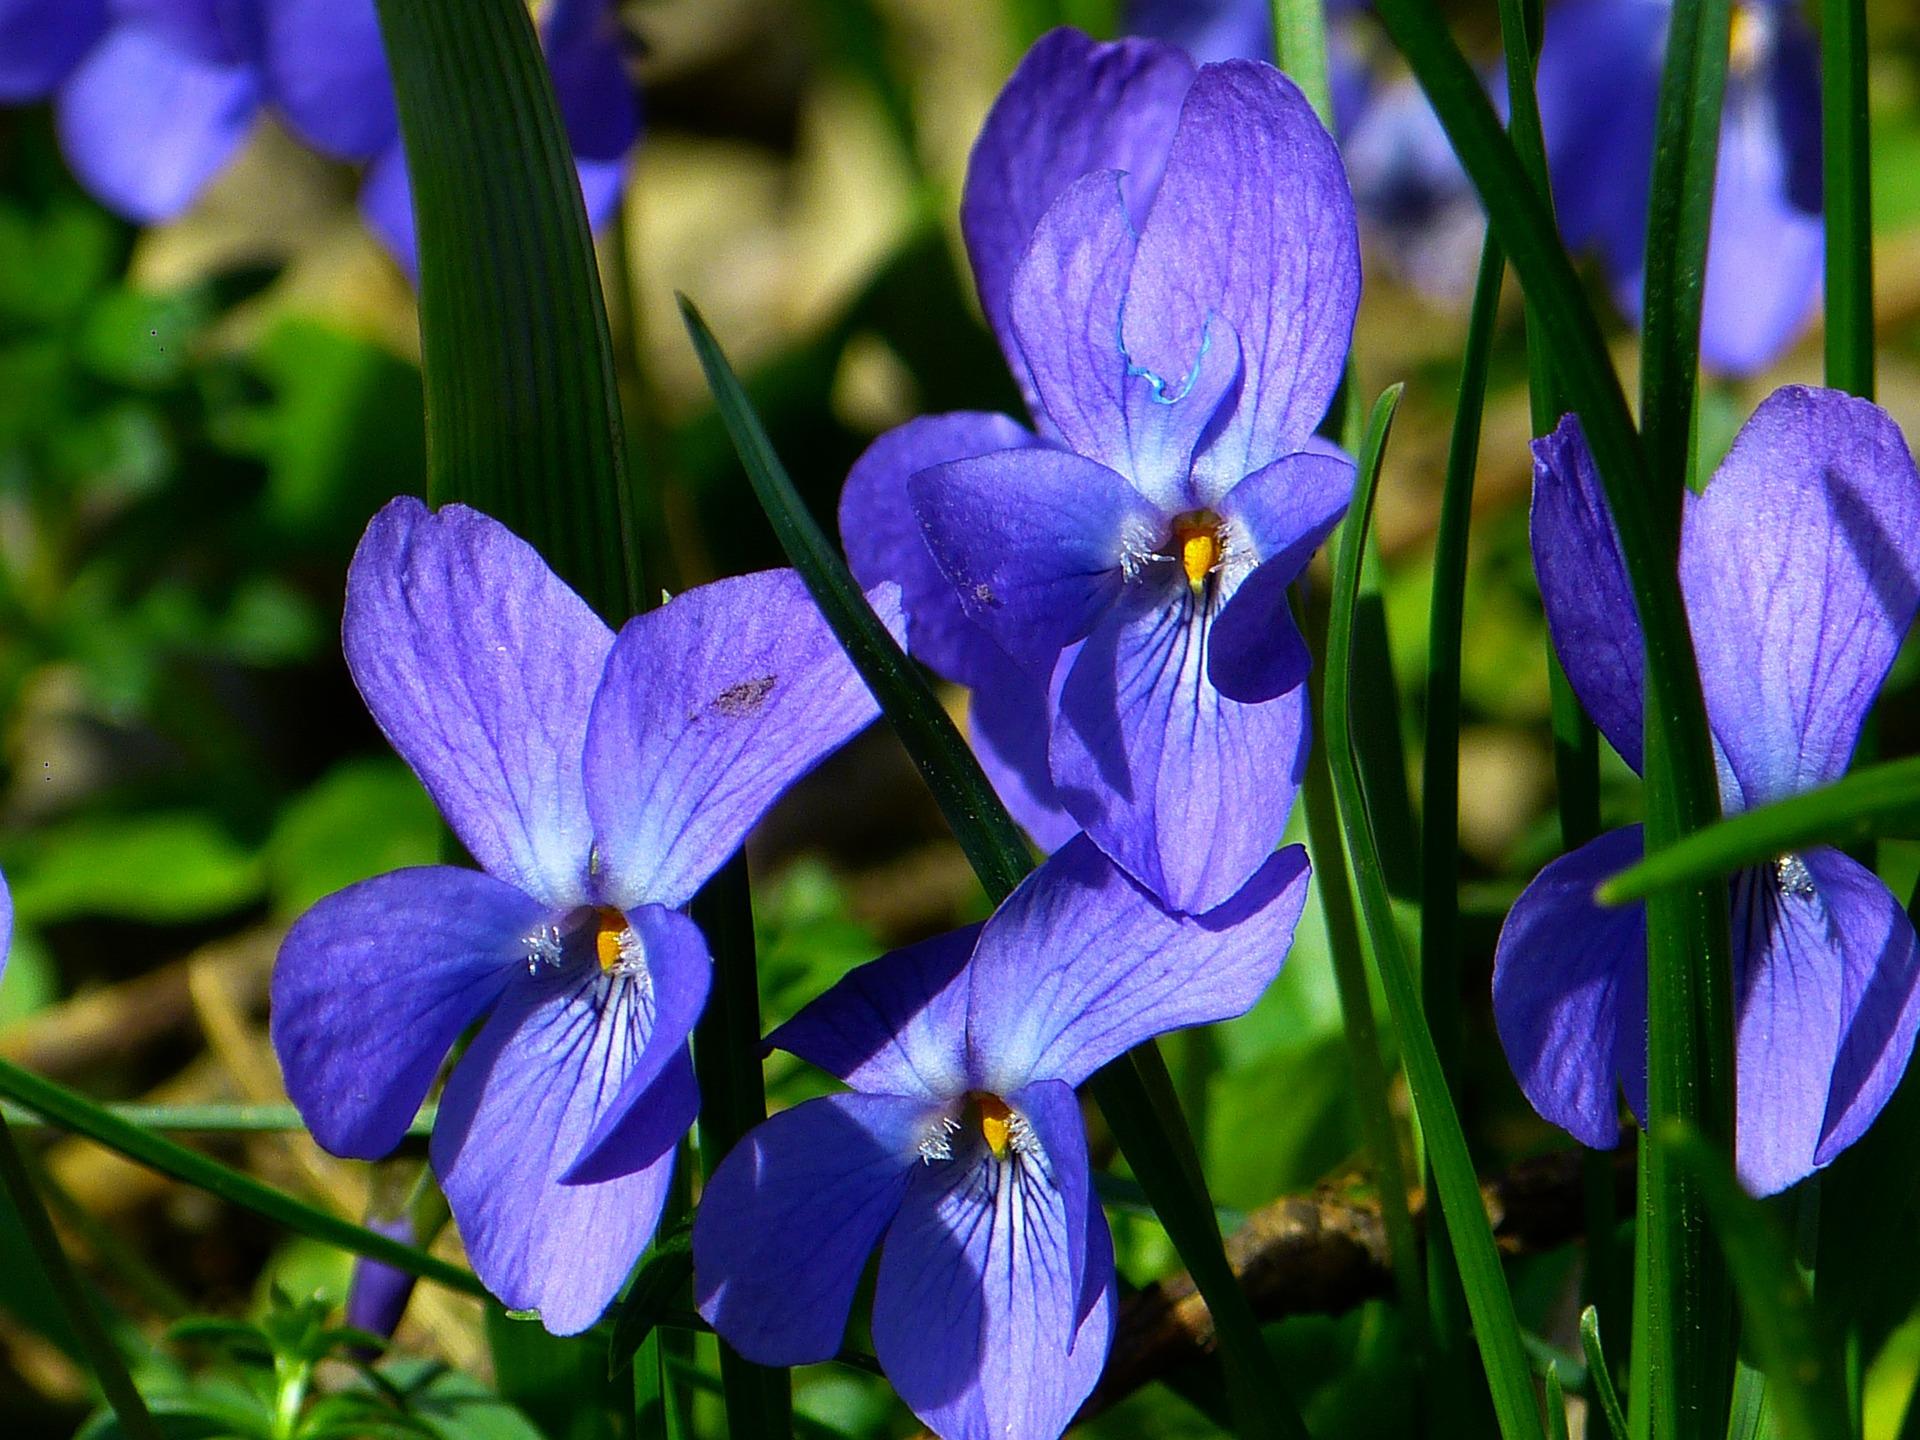 violet-292367_1920.jpg